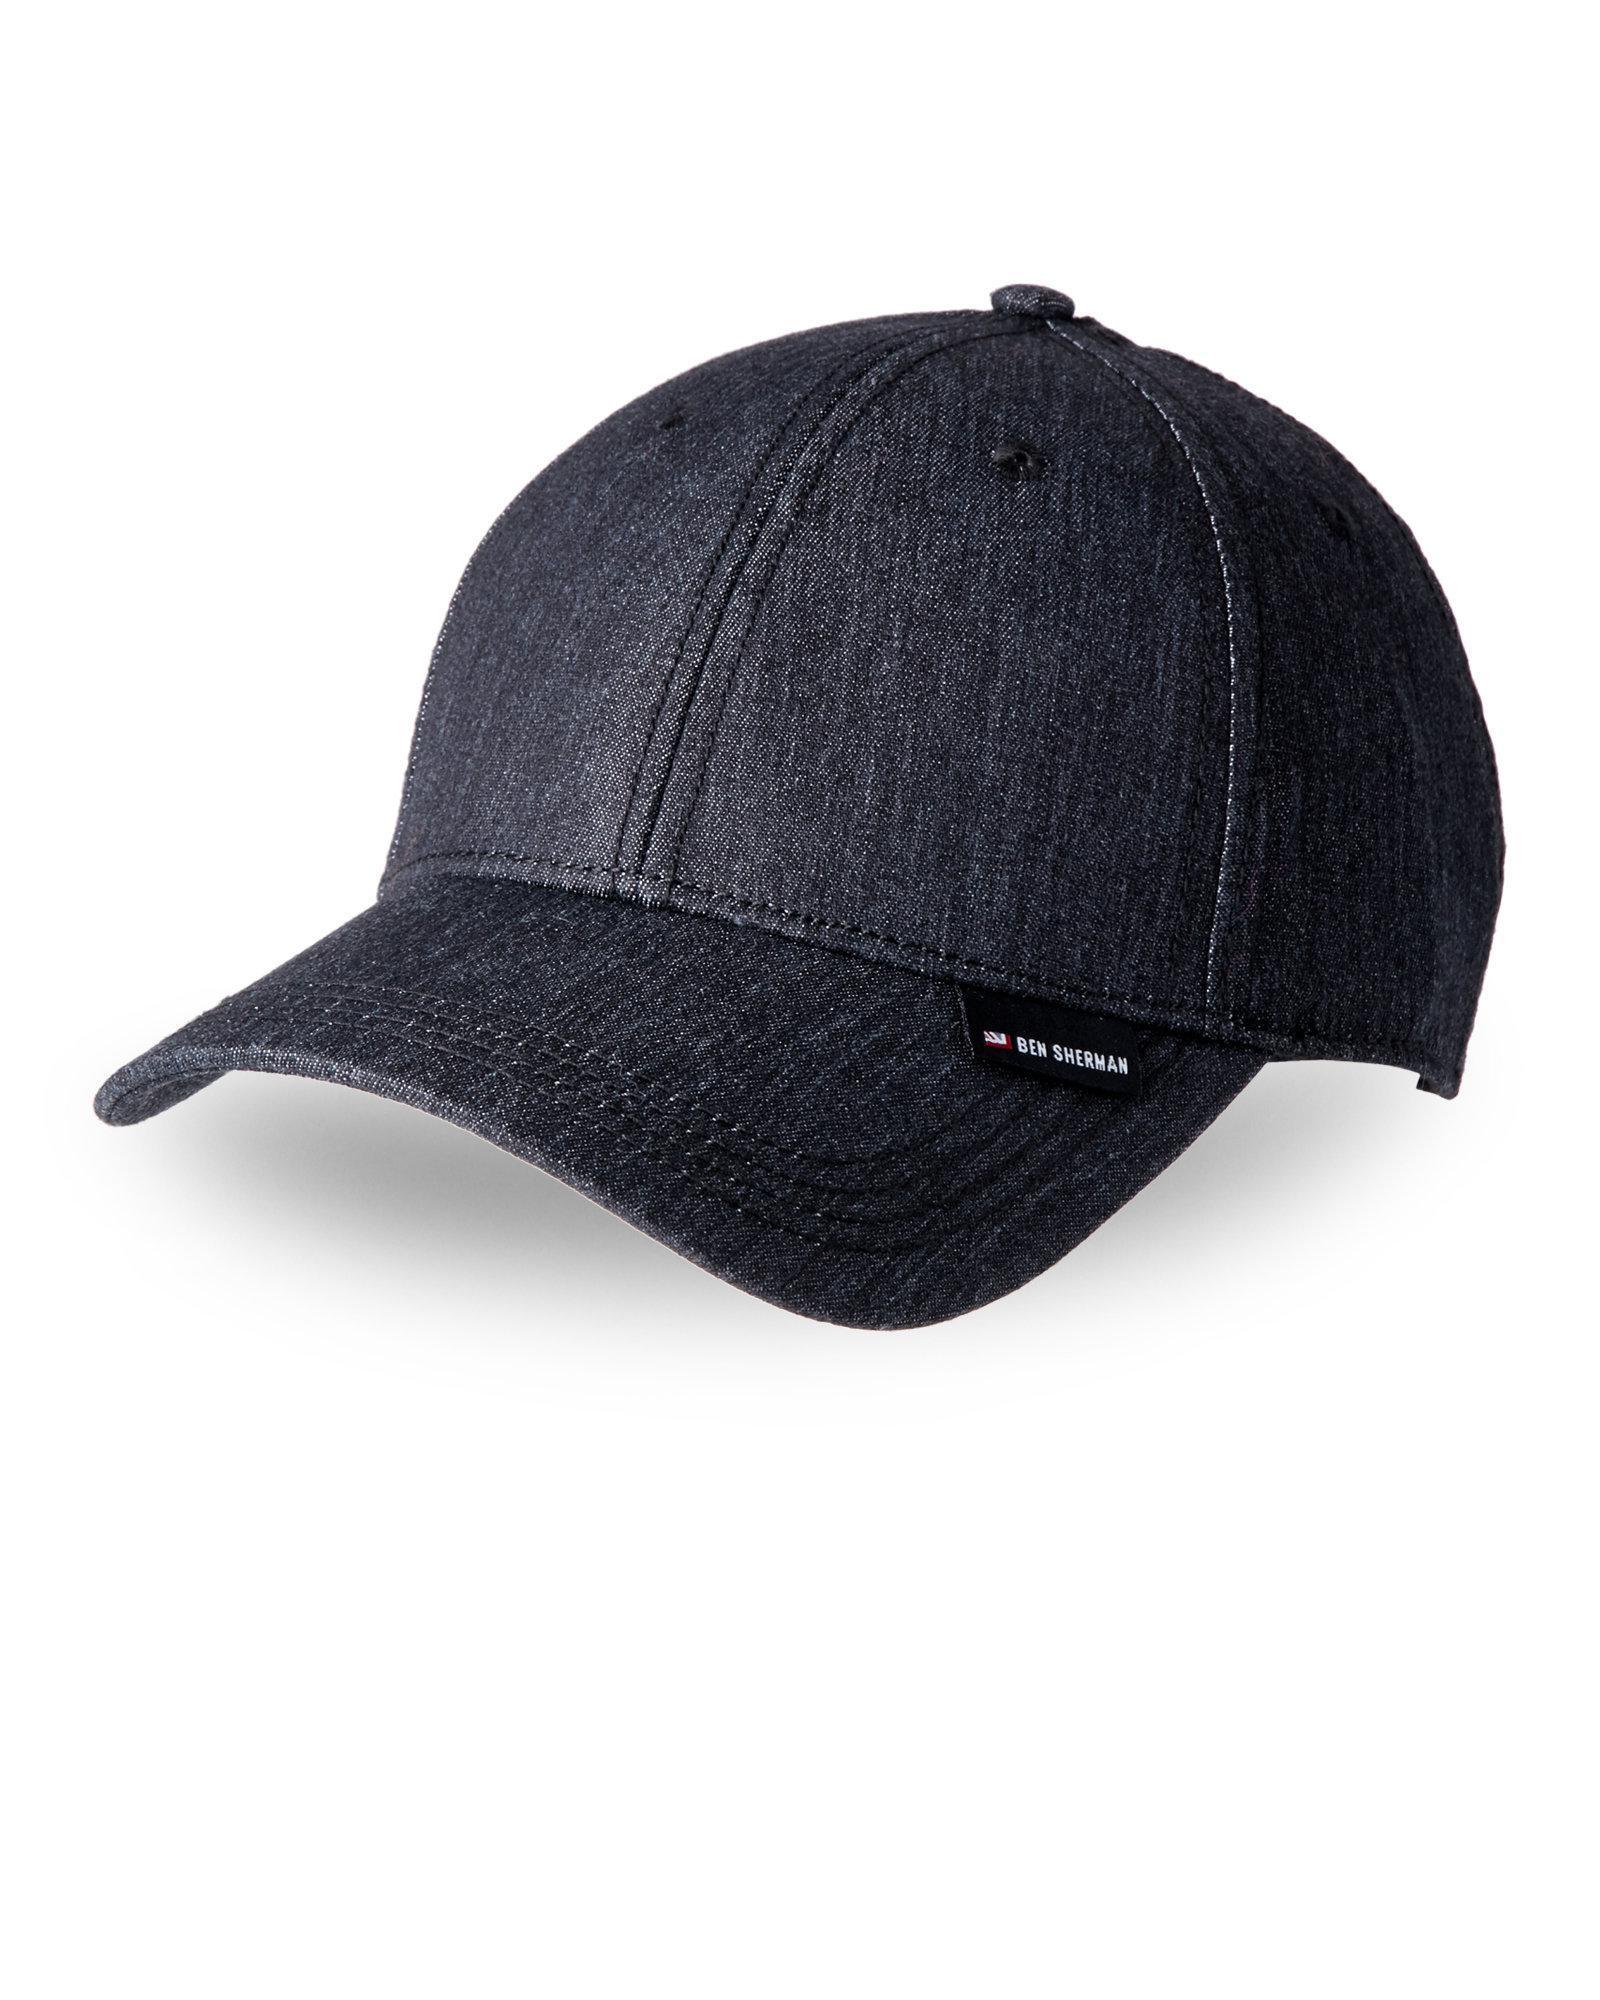 Lyst - Ben Sherman Chambray Baseball Cap in Black for Men 8f5bf04c057